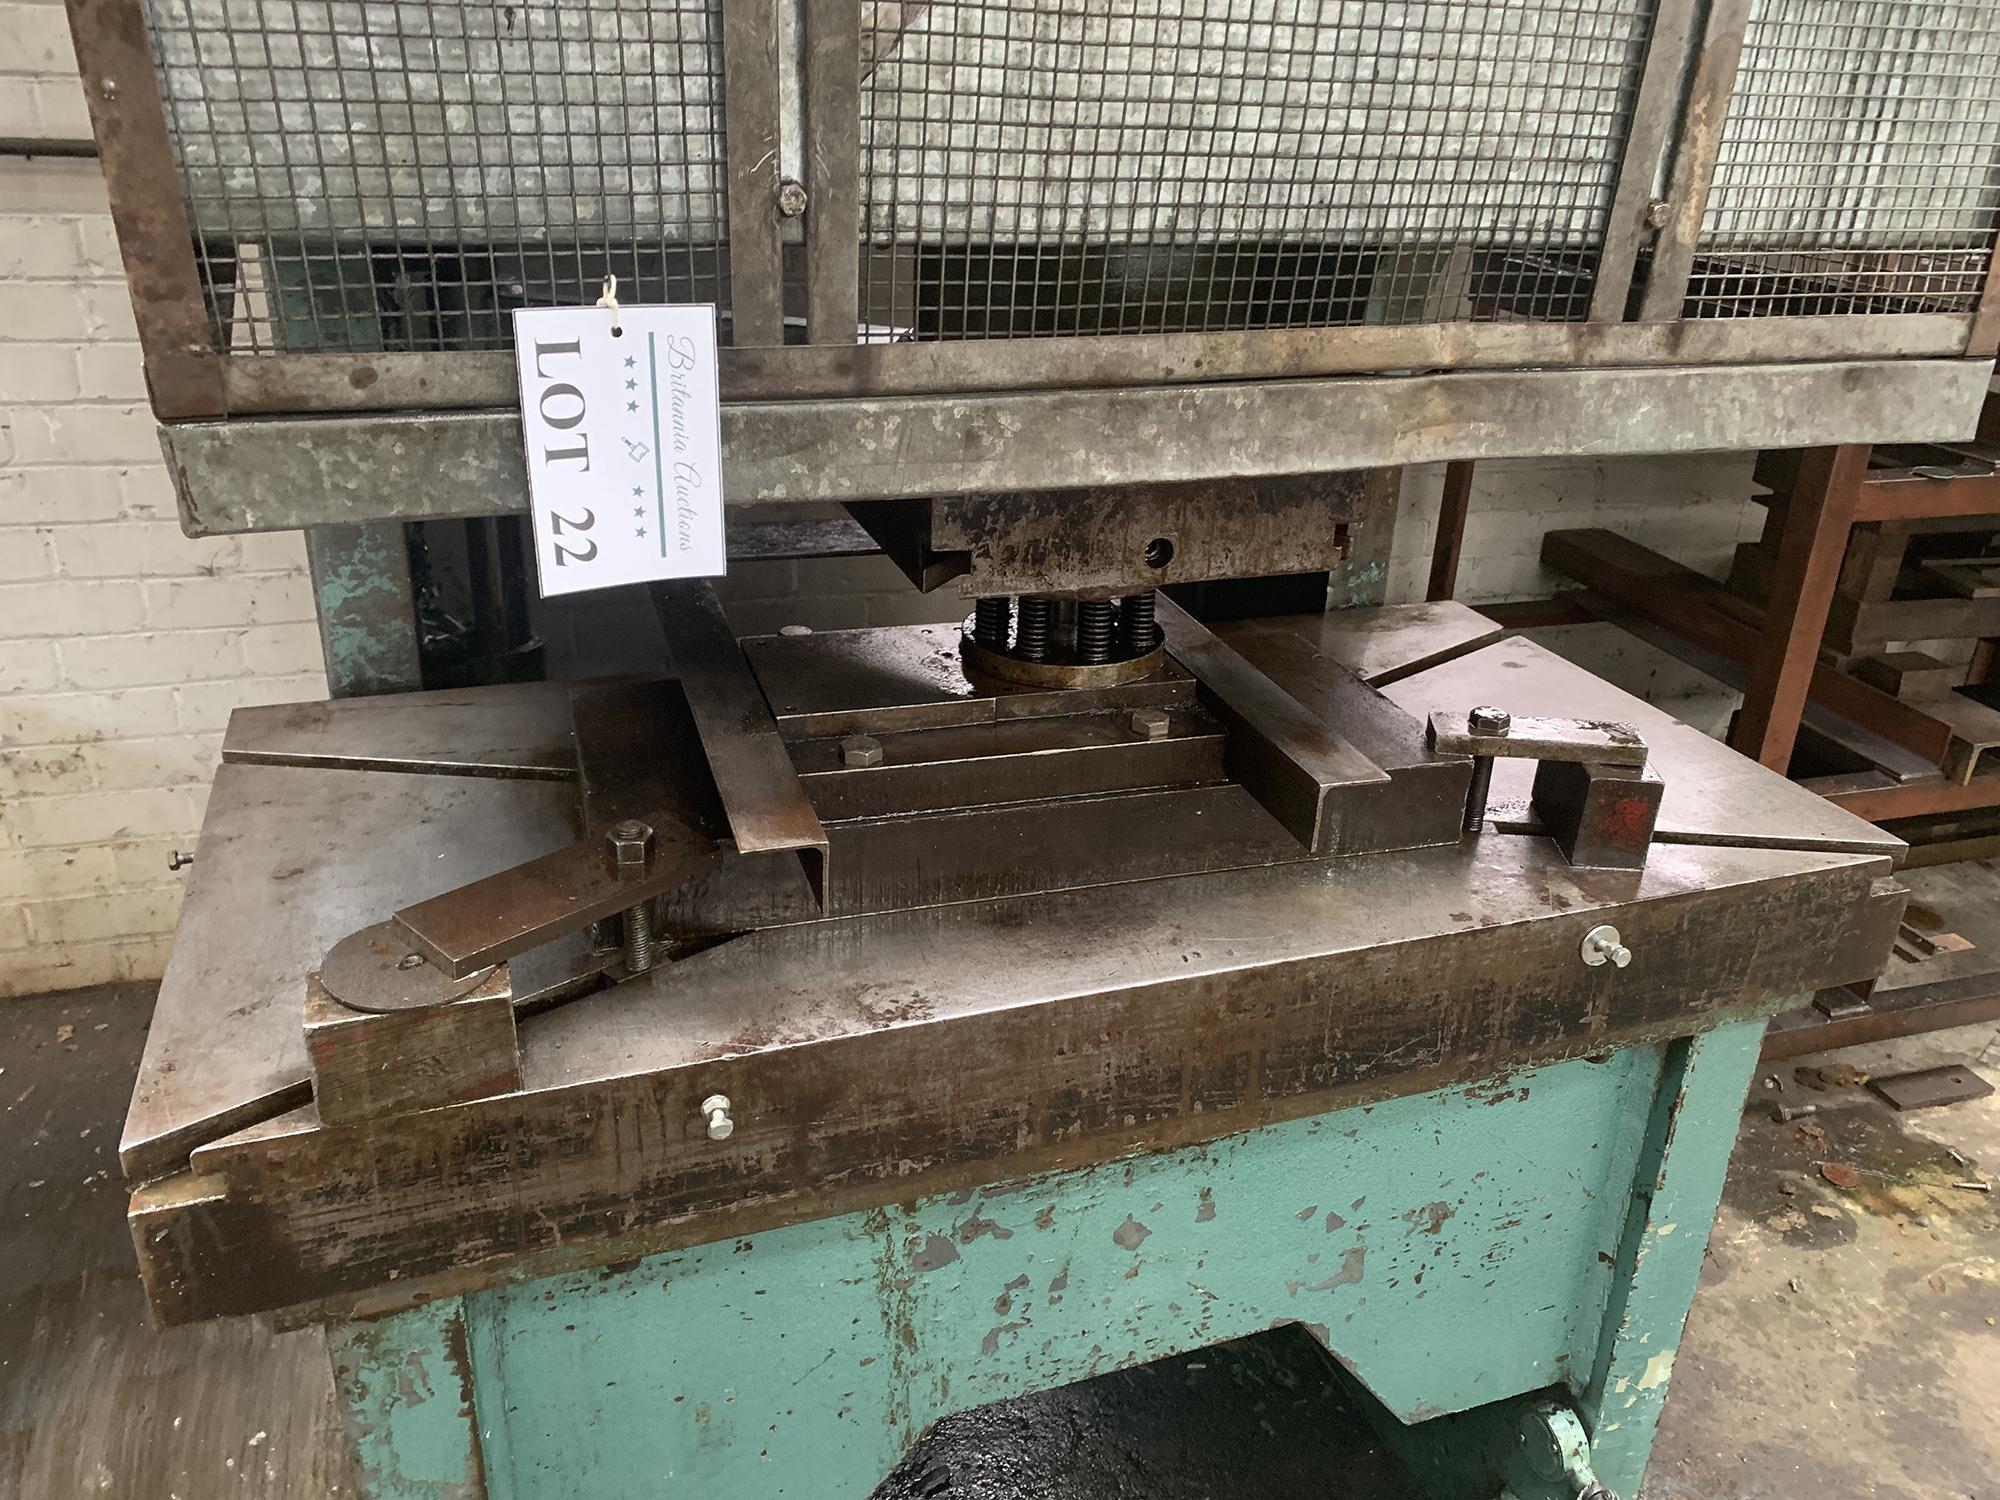 Barnes Hydraulic Press. 100 Ton Capacity. 24'' x 48'' Platen Size. - Image 3 of 5